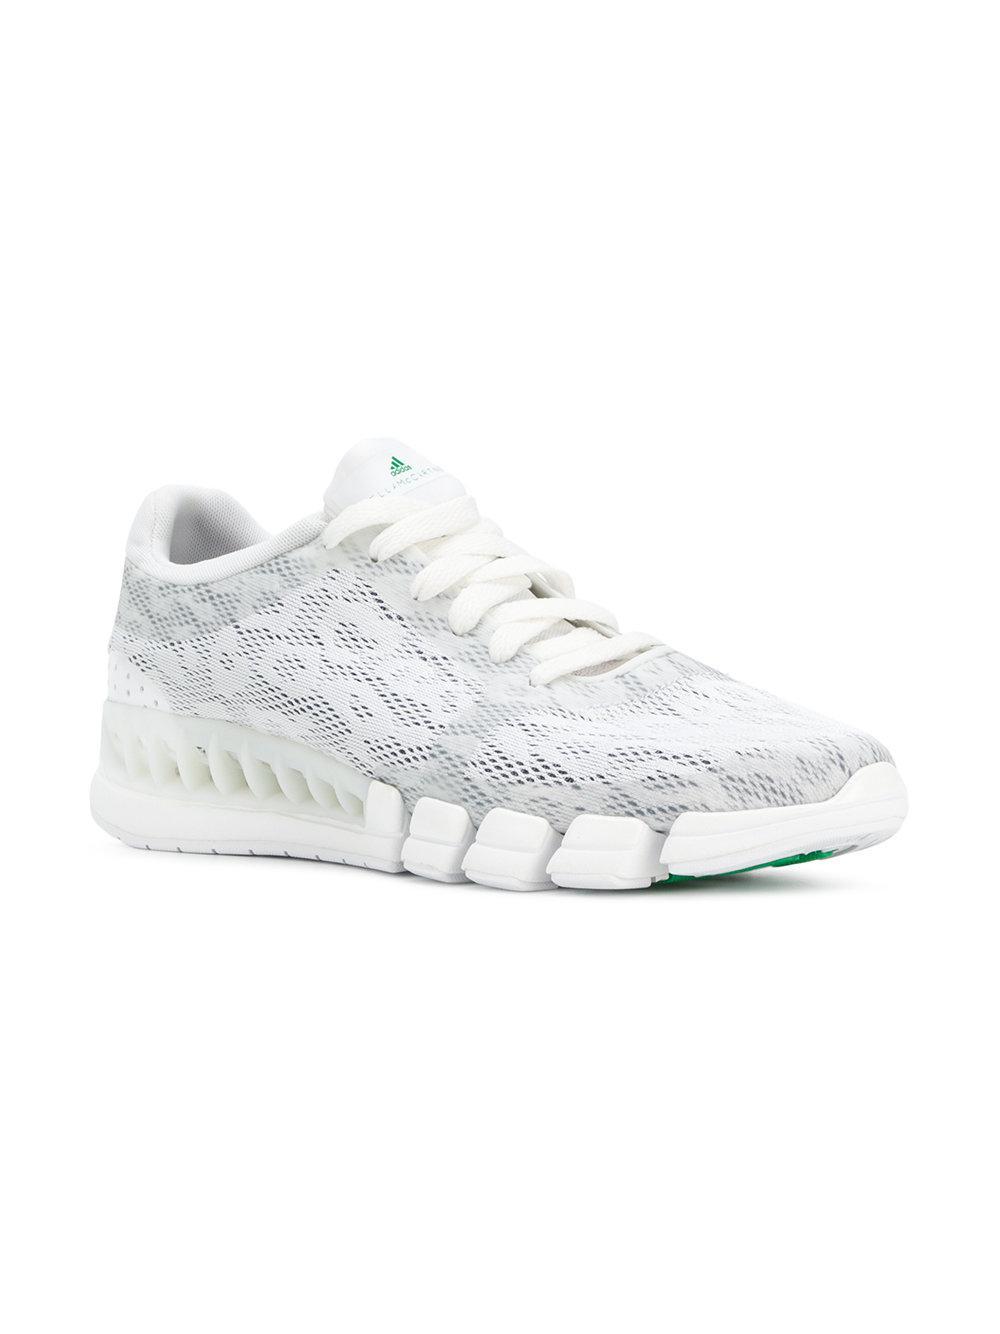 Adidas By Stella Mccartney Kea Clima sneakers - White farfetch bianco 2018 Precio Barato Unisex Comprar El Sitio Oficial Barato I68Vd